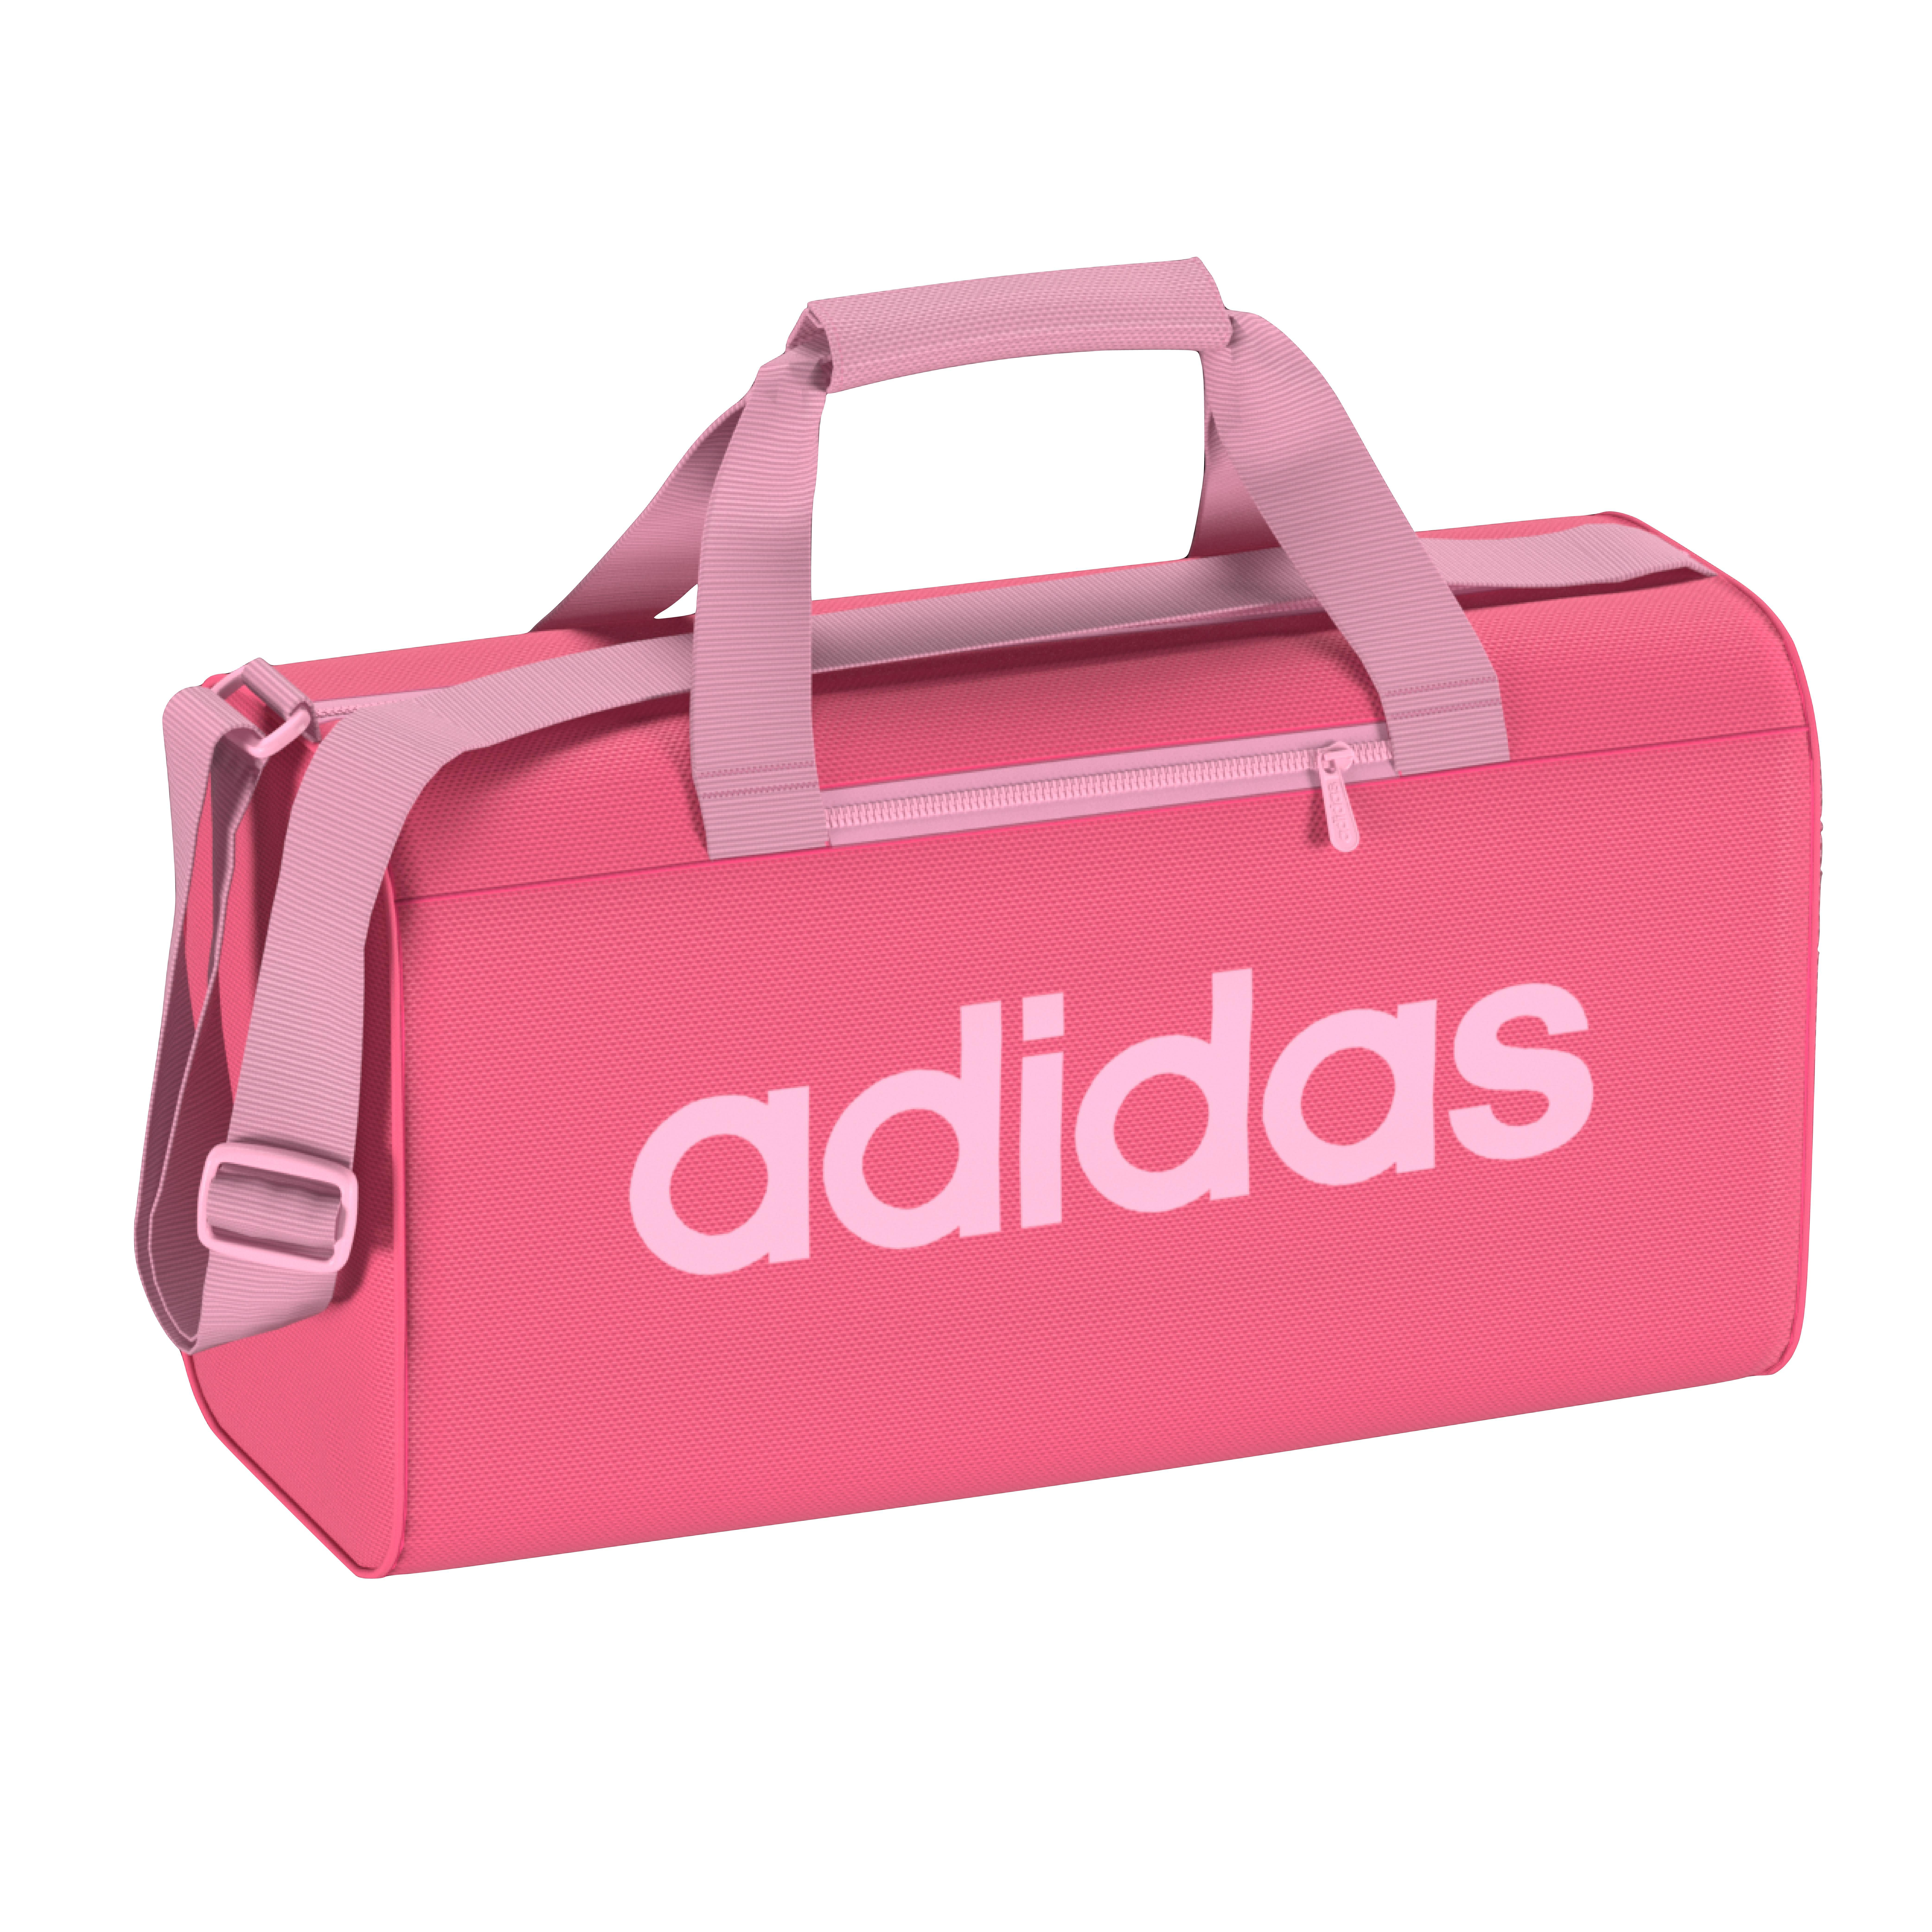 59e602f92 Adidas | Ropa | Zapatillas | en Decathlon